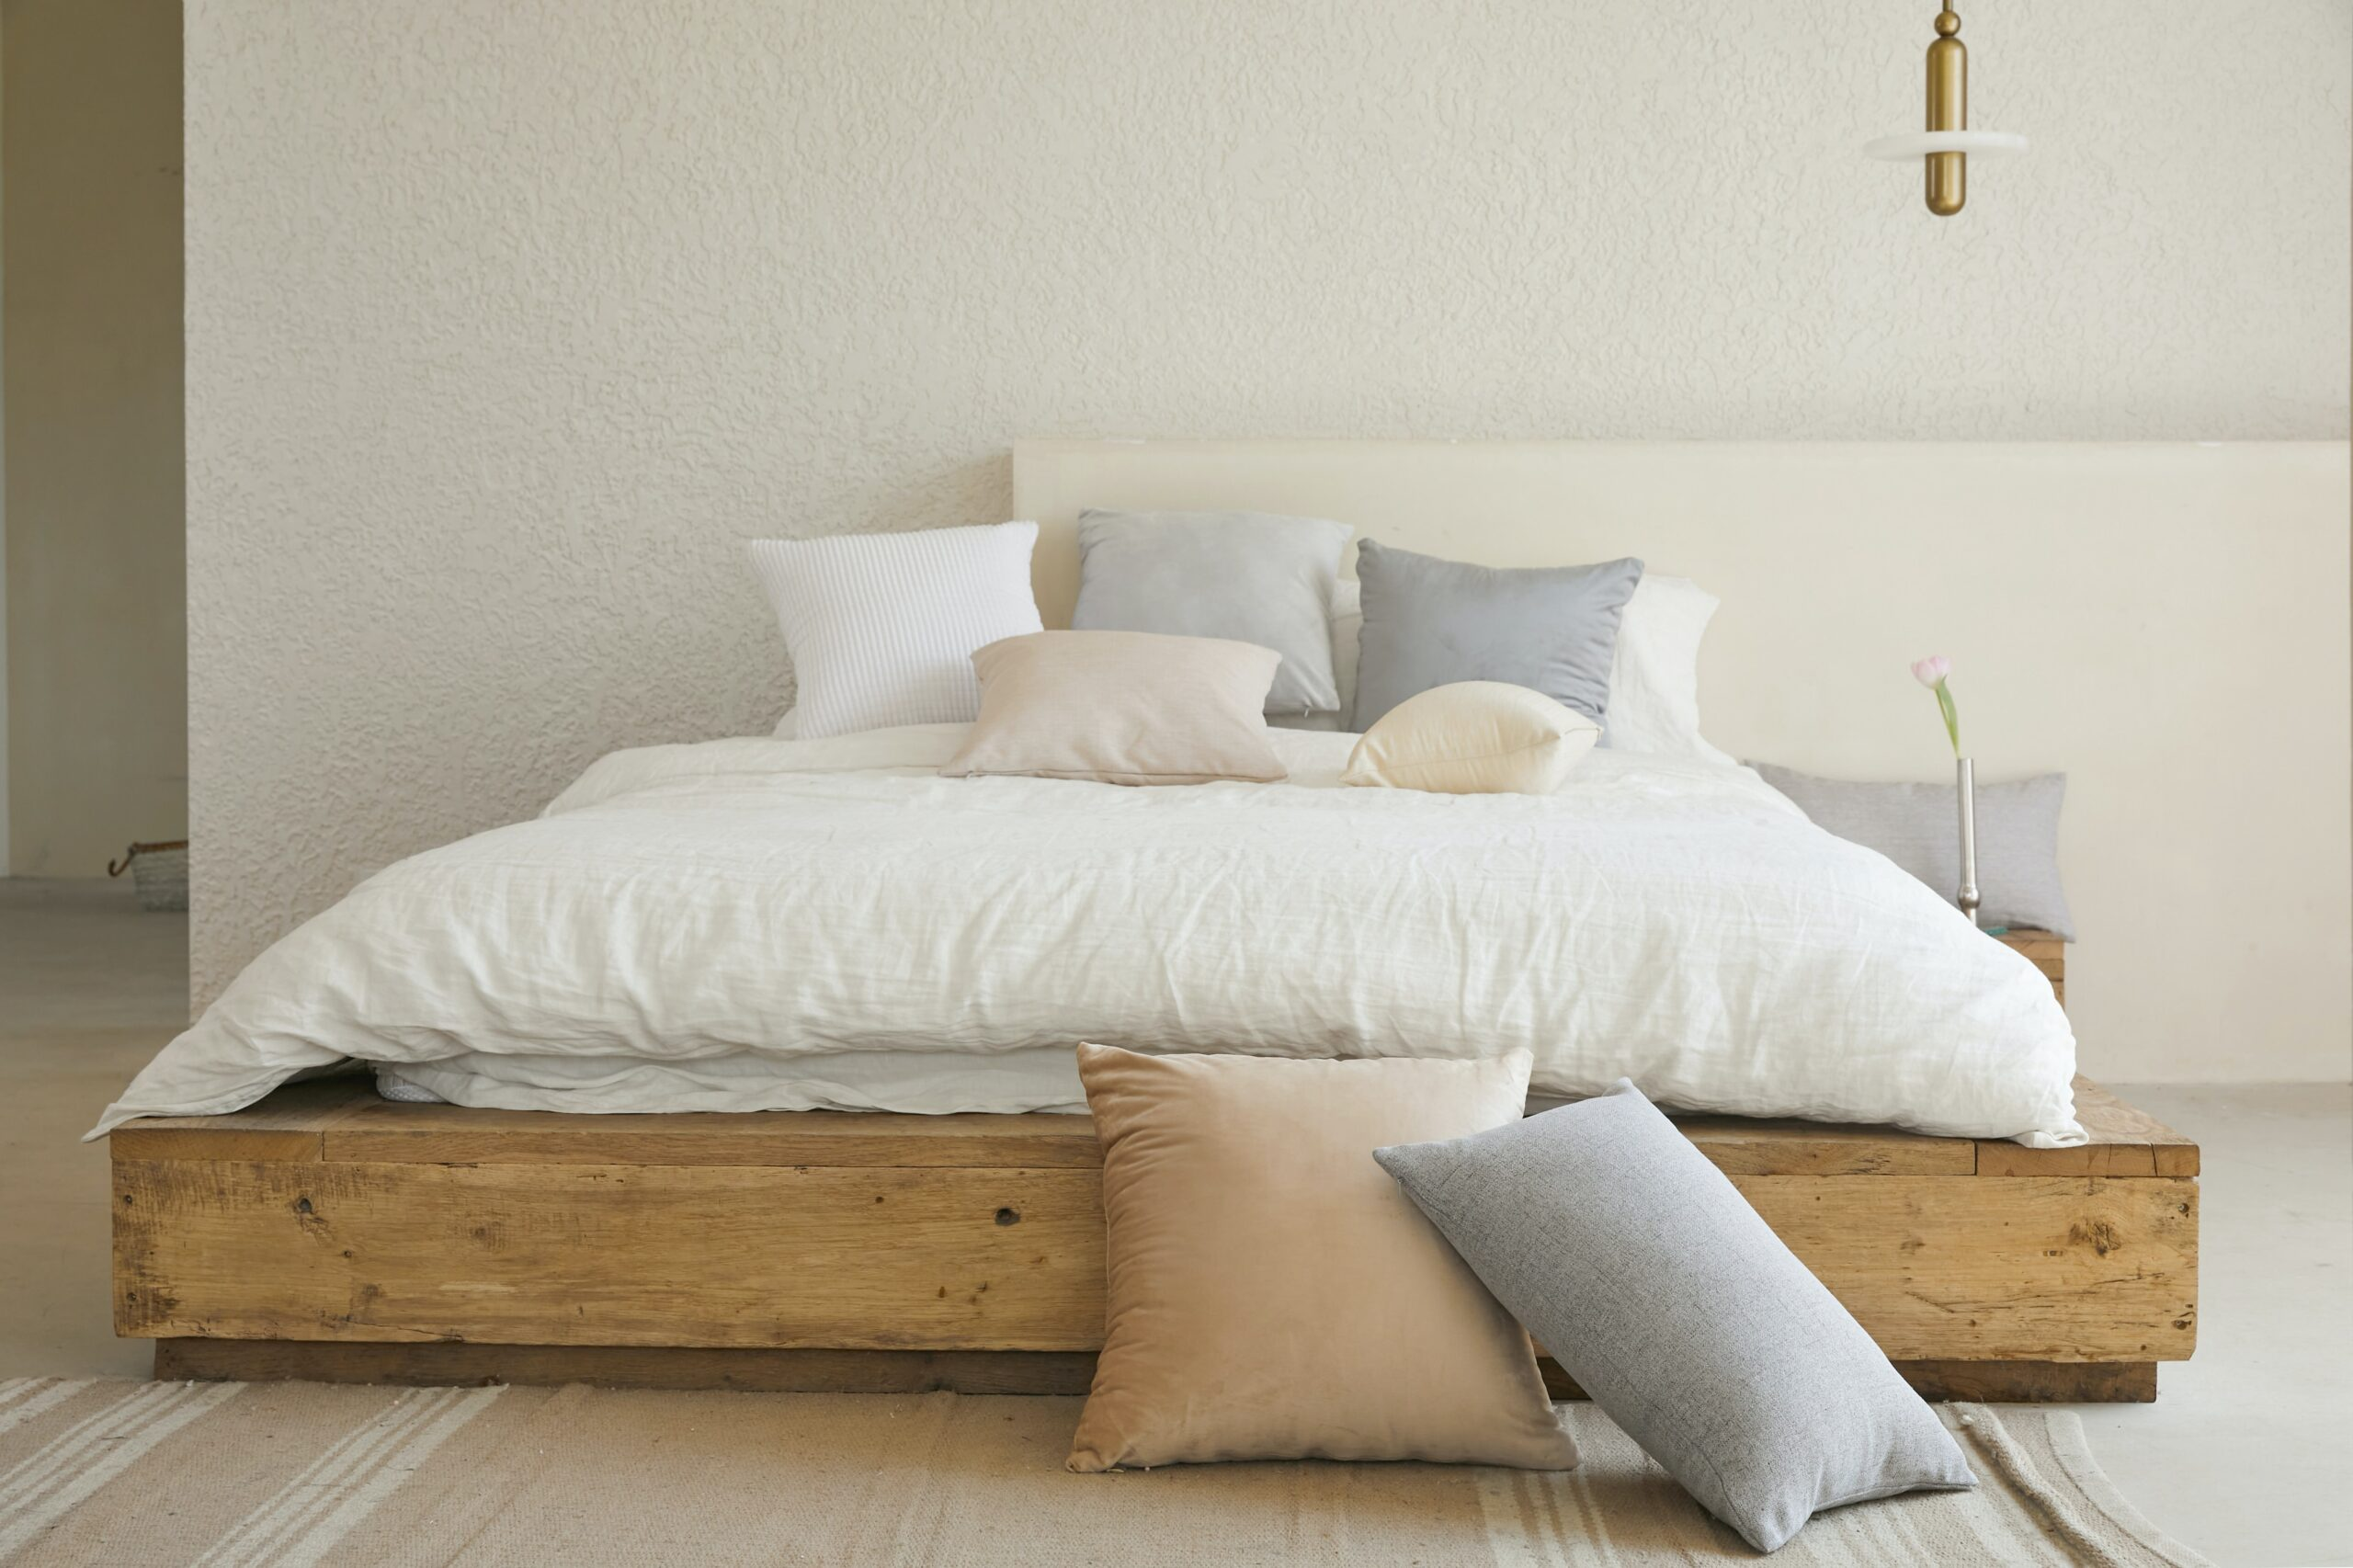 Snug Bedding